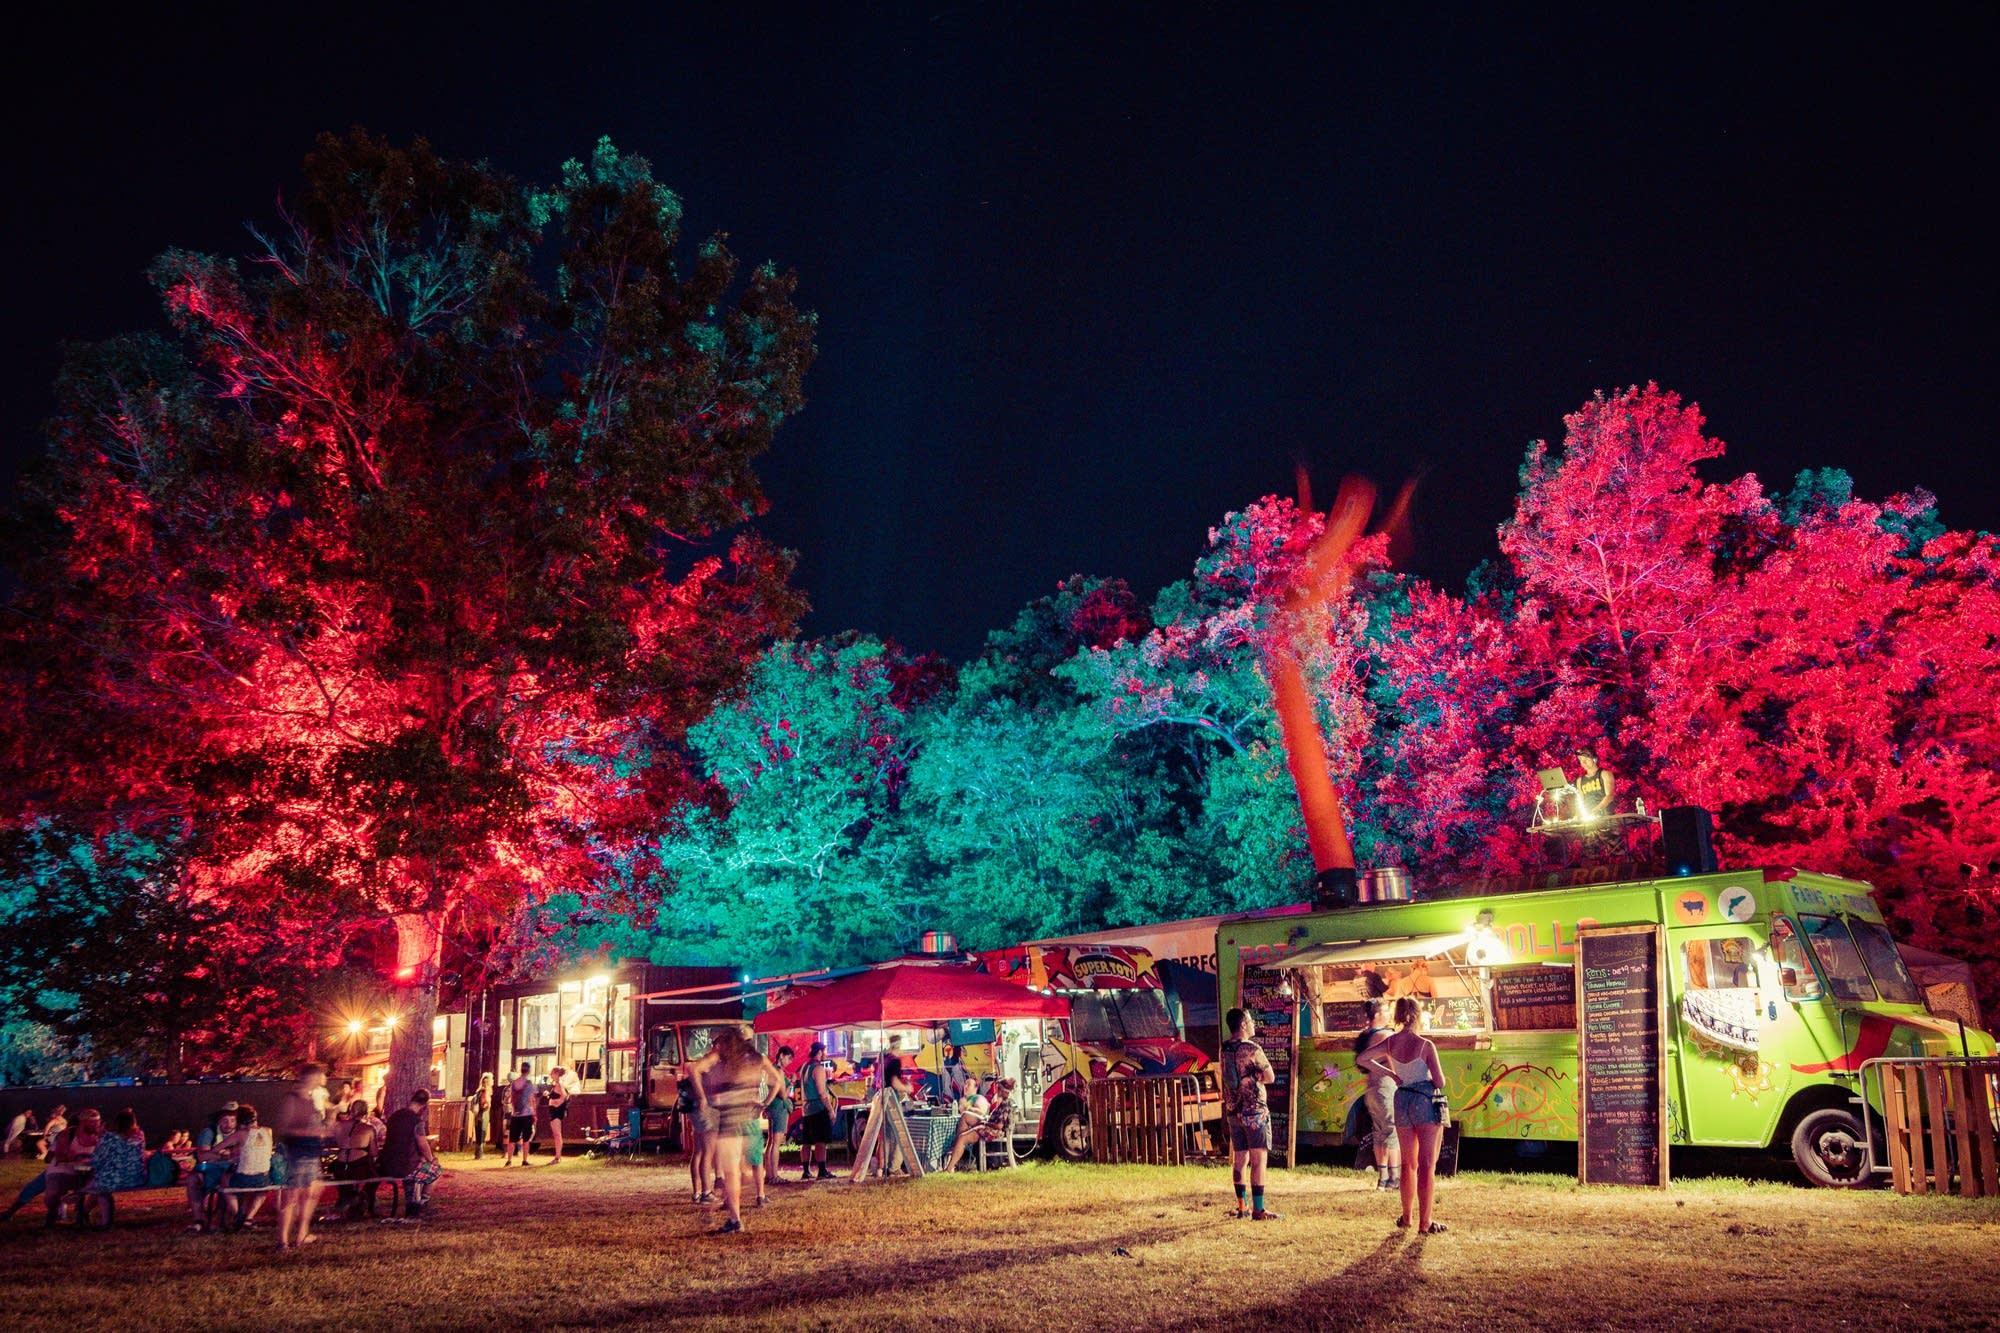 Bonnaroo Music and Arts Festival press photo